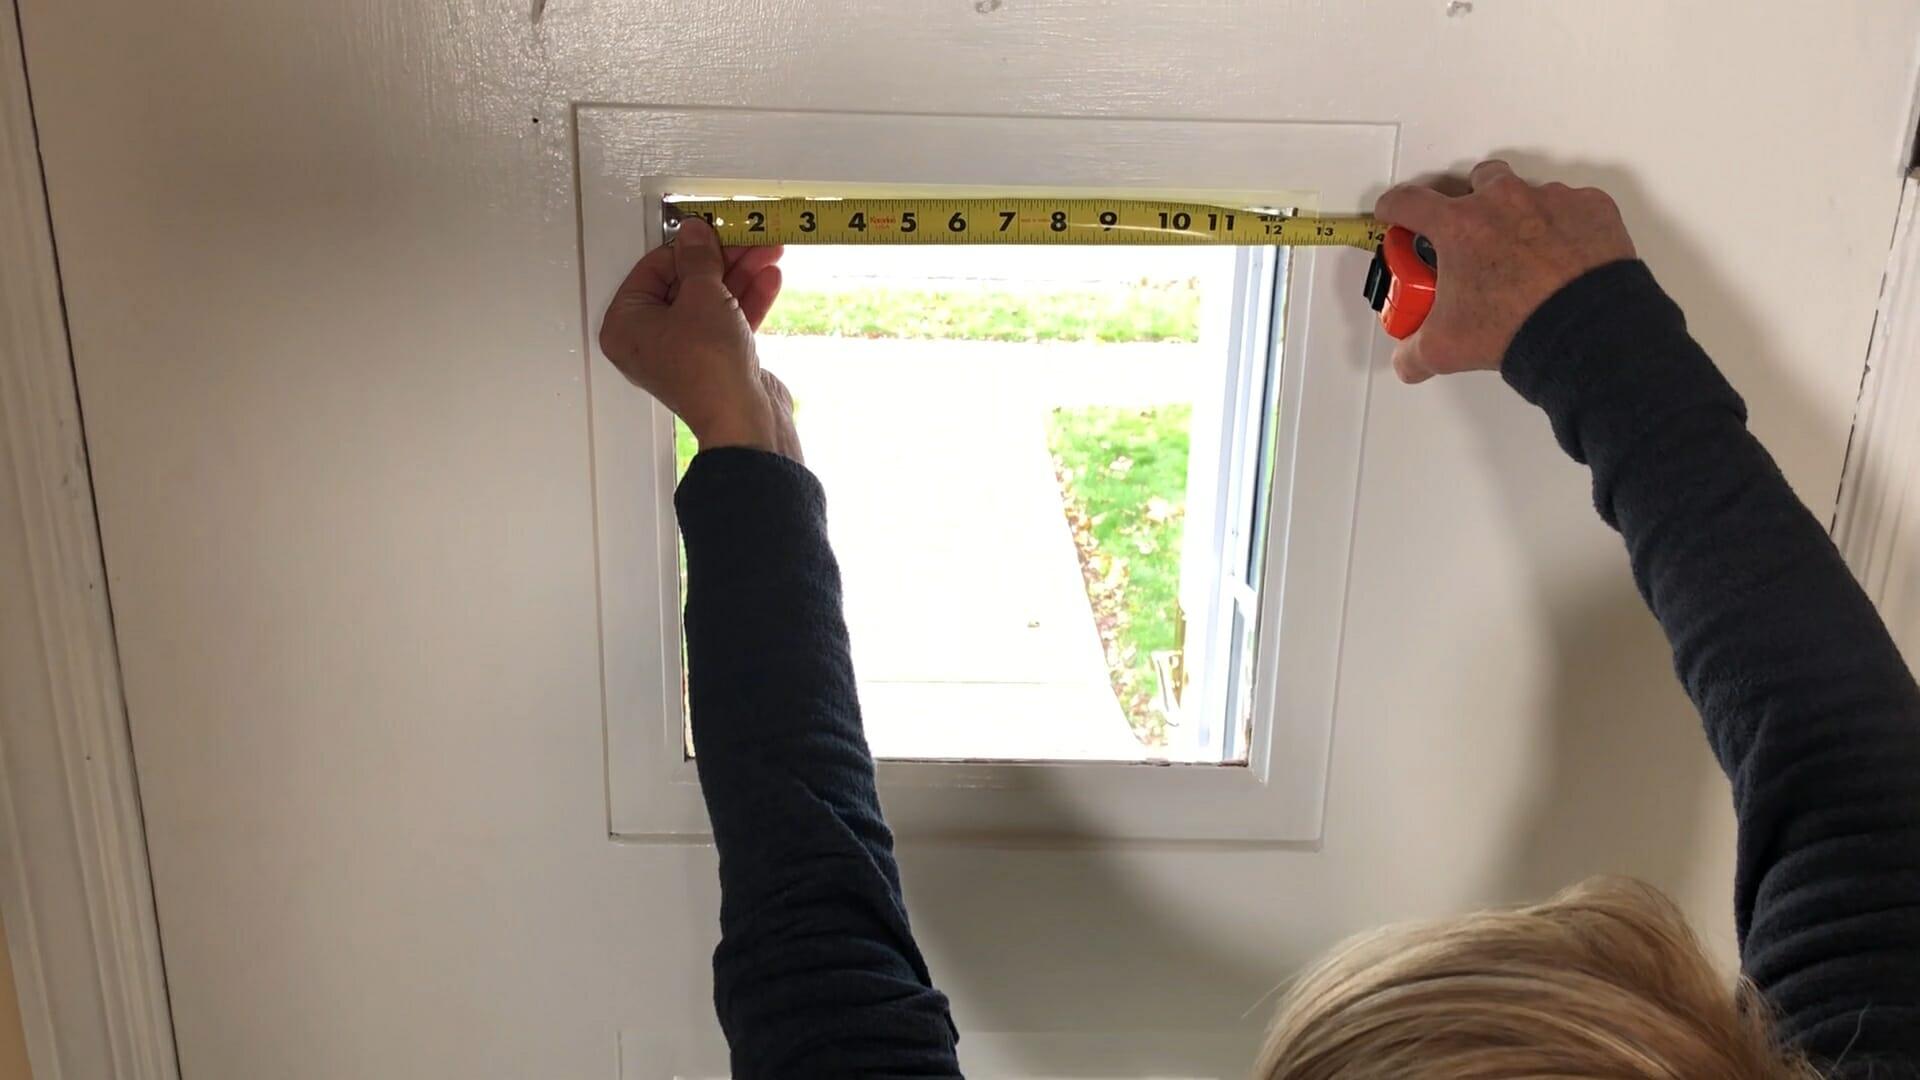 woman using a tape measure to measure window